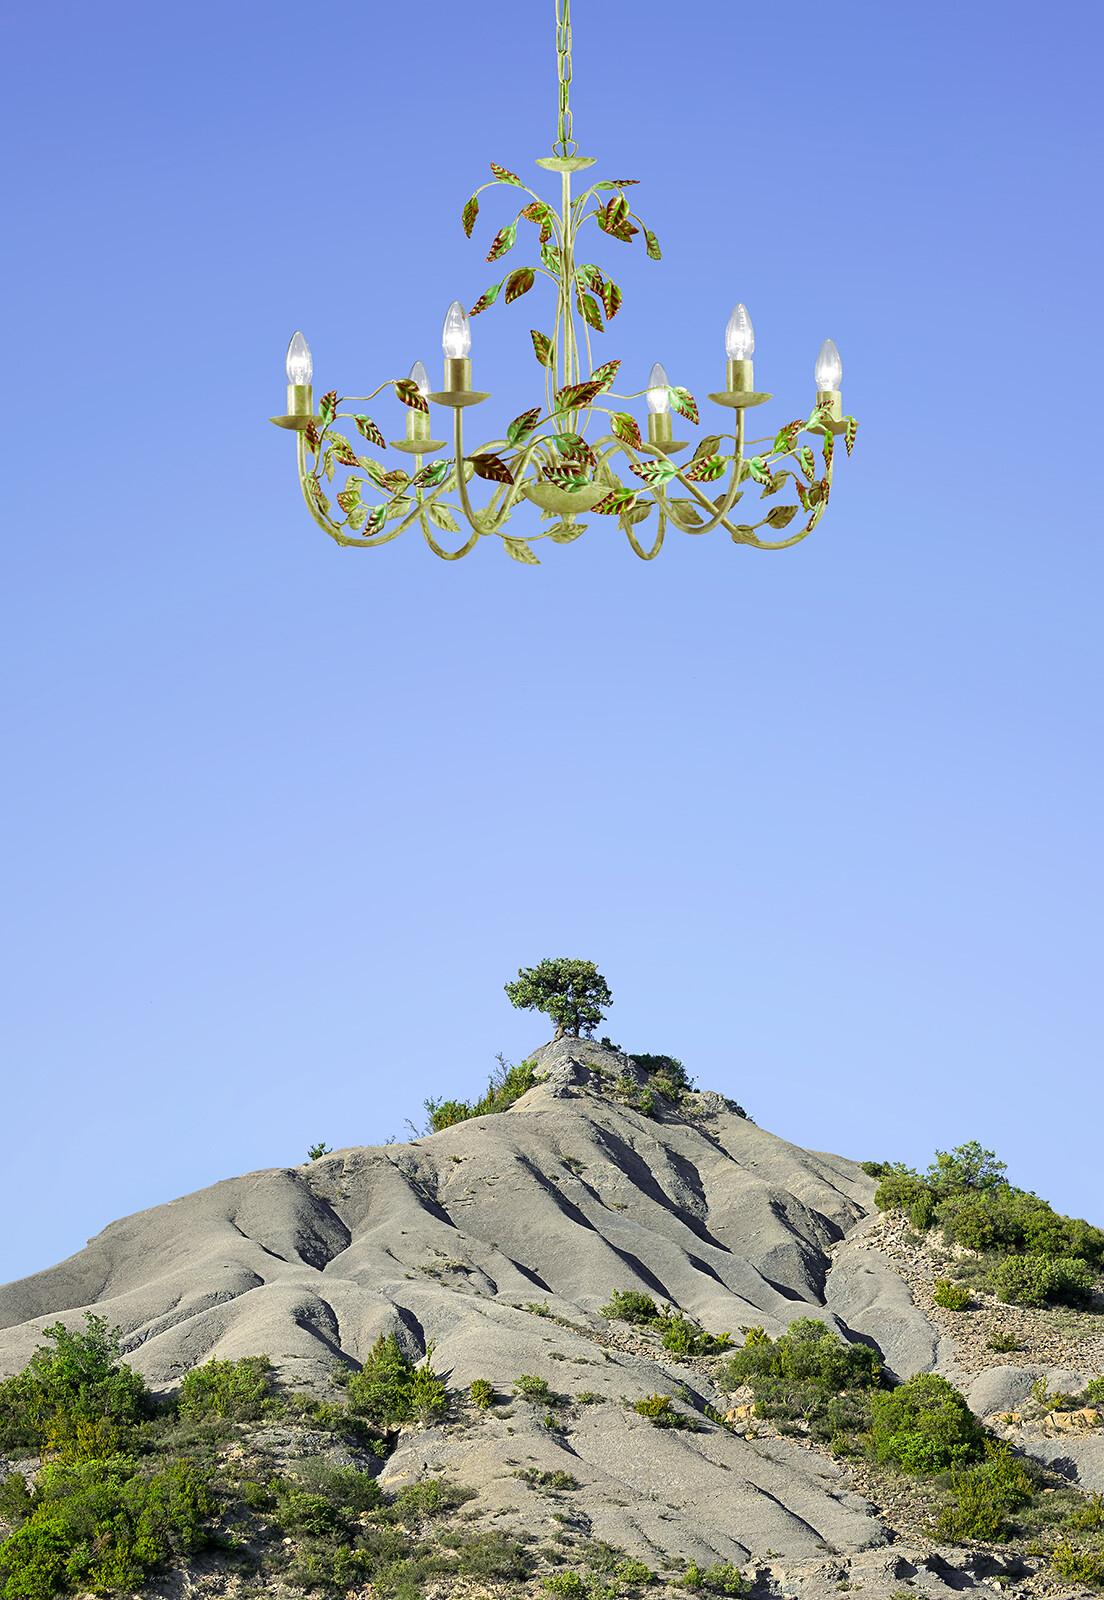 The Tree, Pyrenees  - Ciuco Gutiérrez